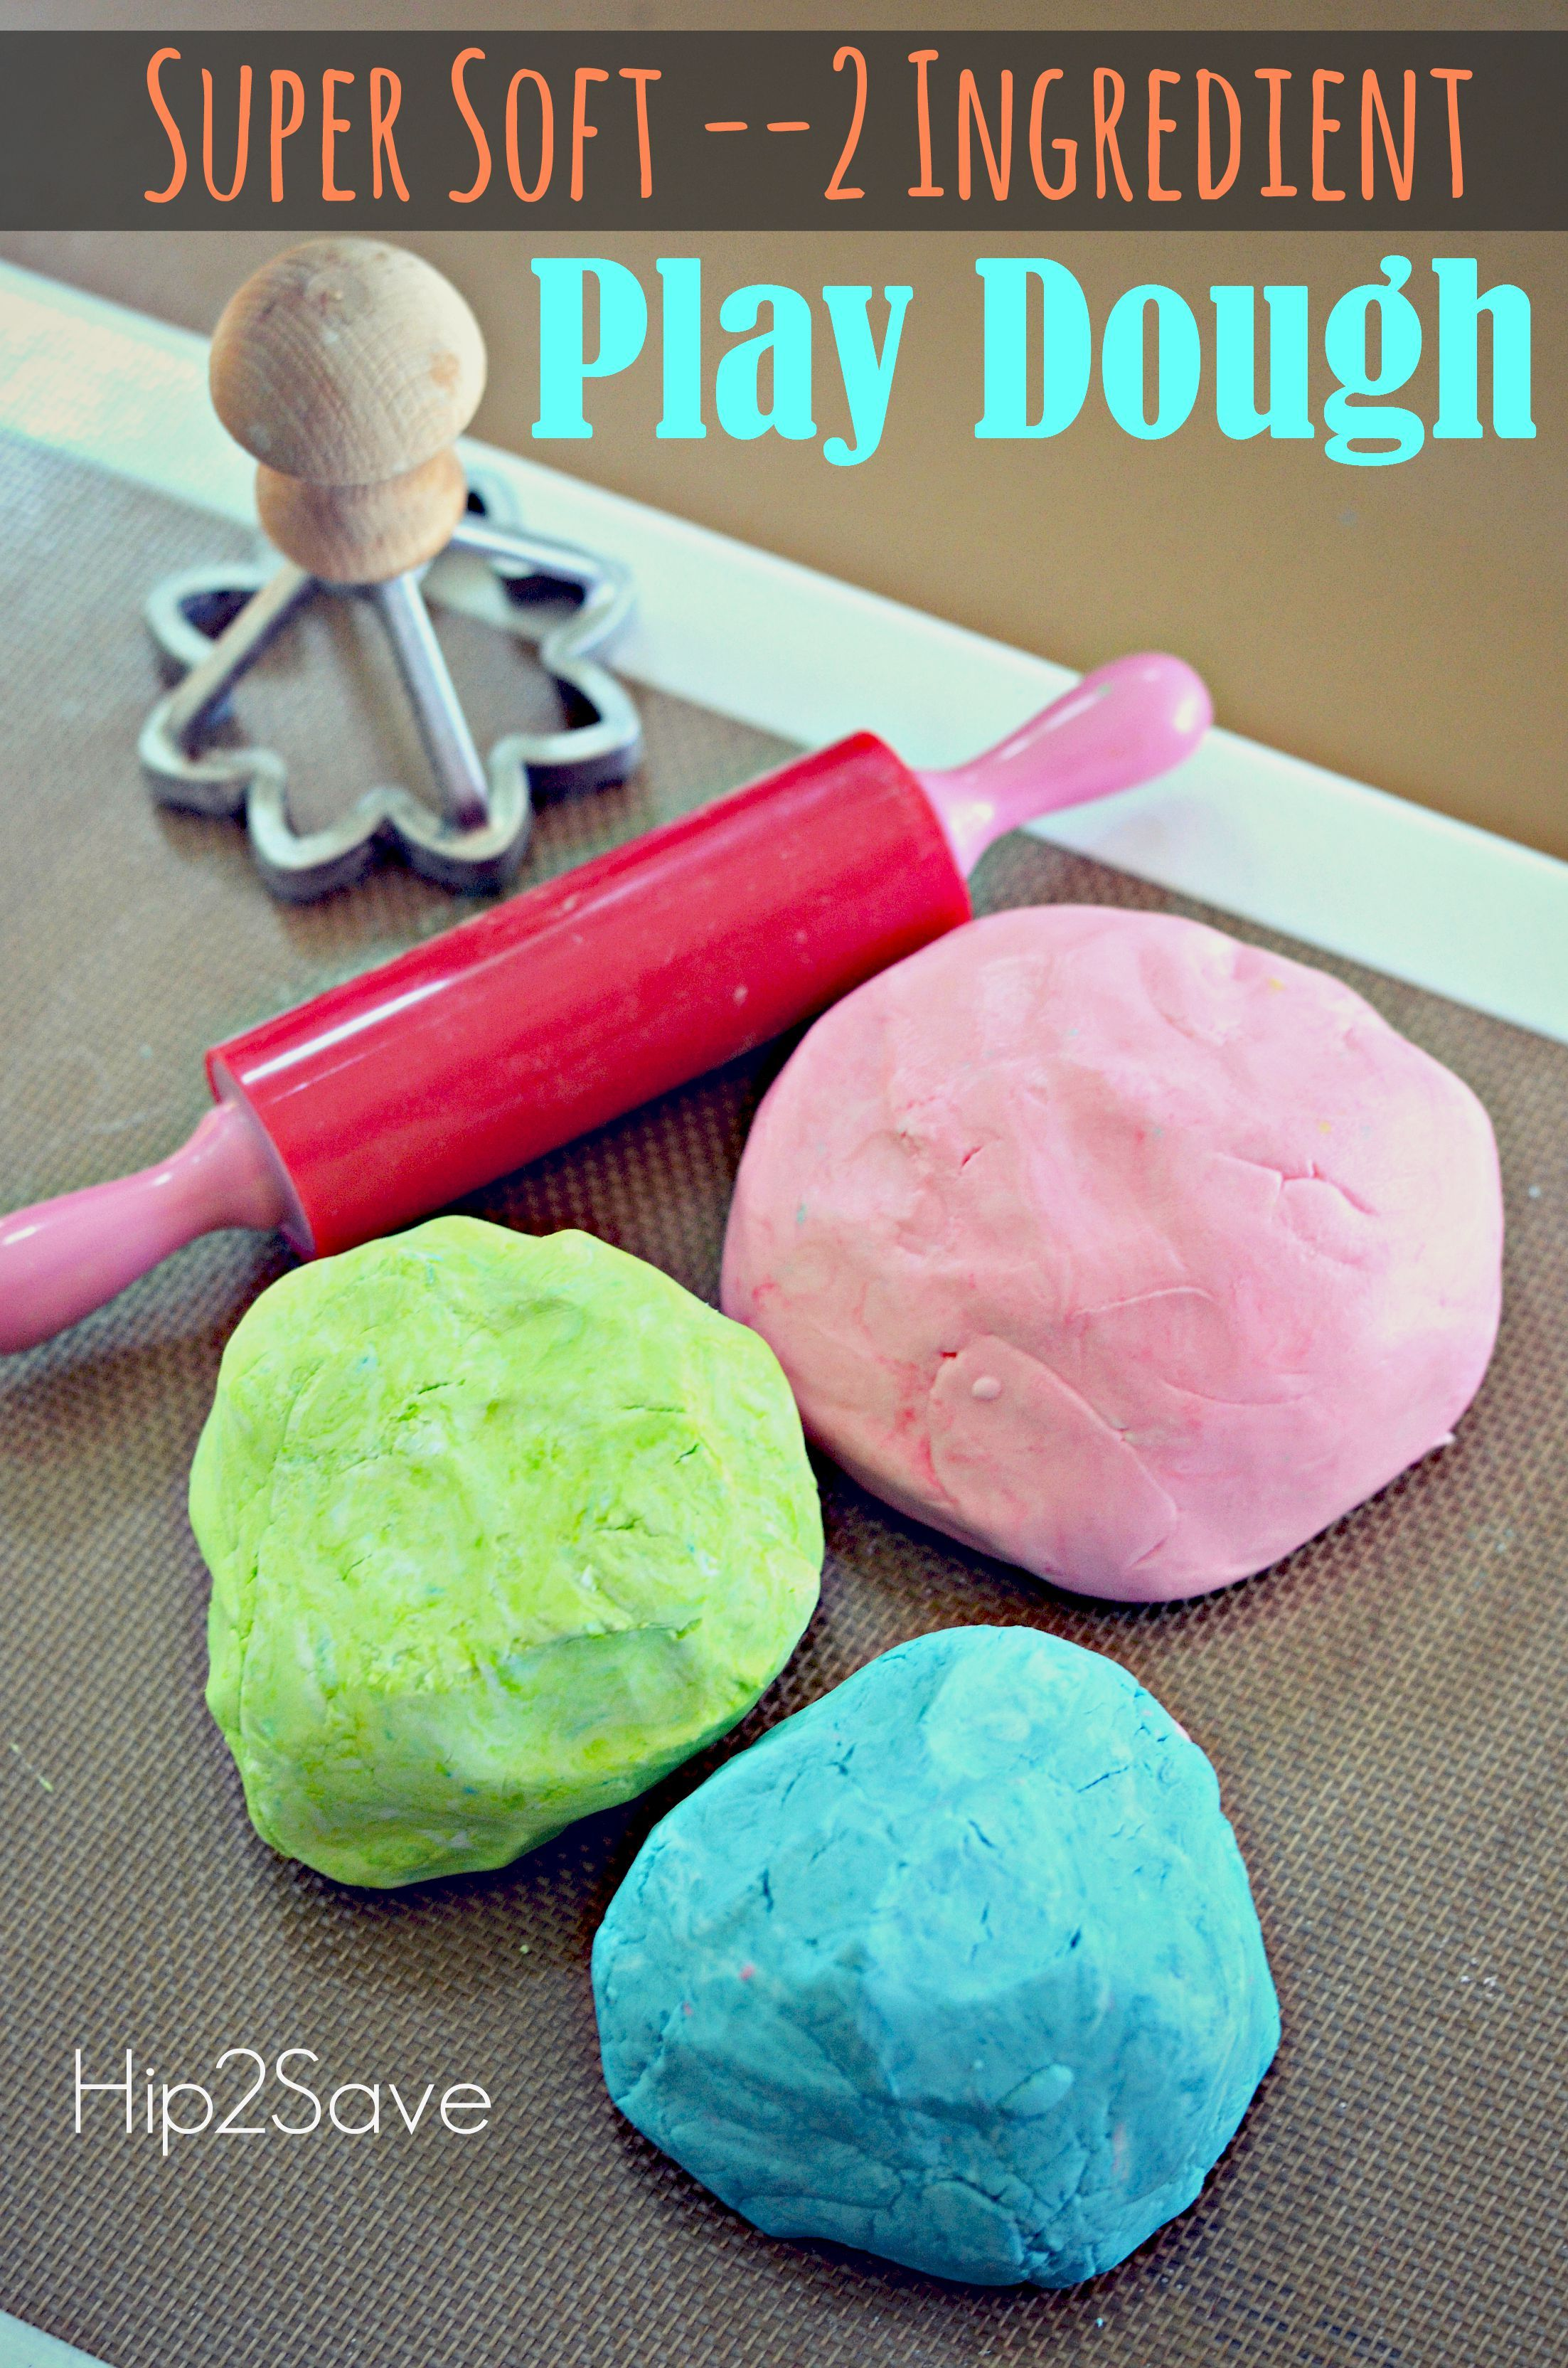 Keto Buffalo Chicken Soup Recipe Soft play dough, Fun